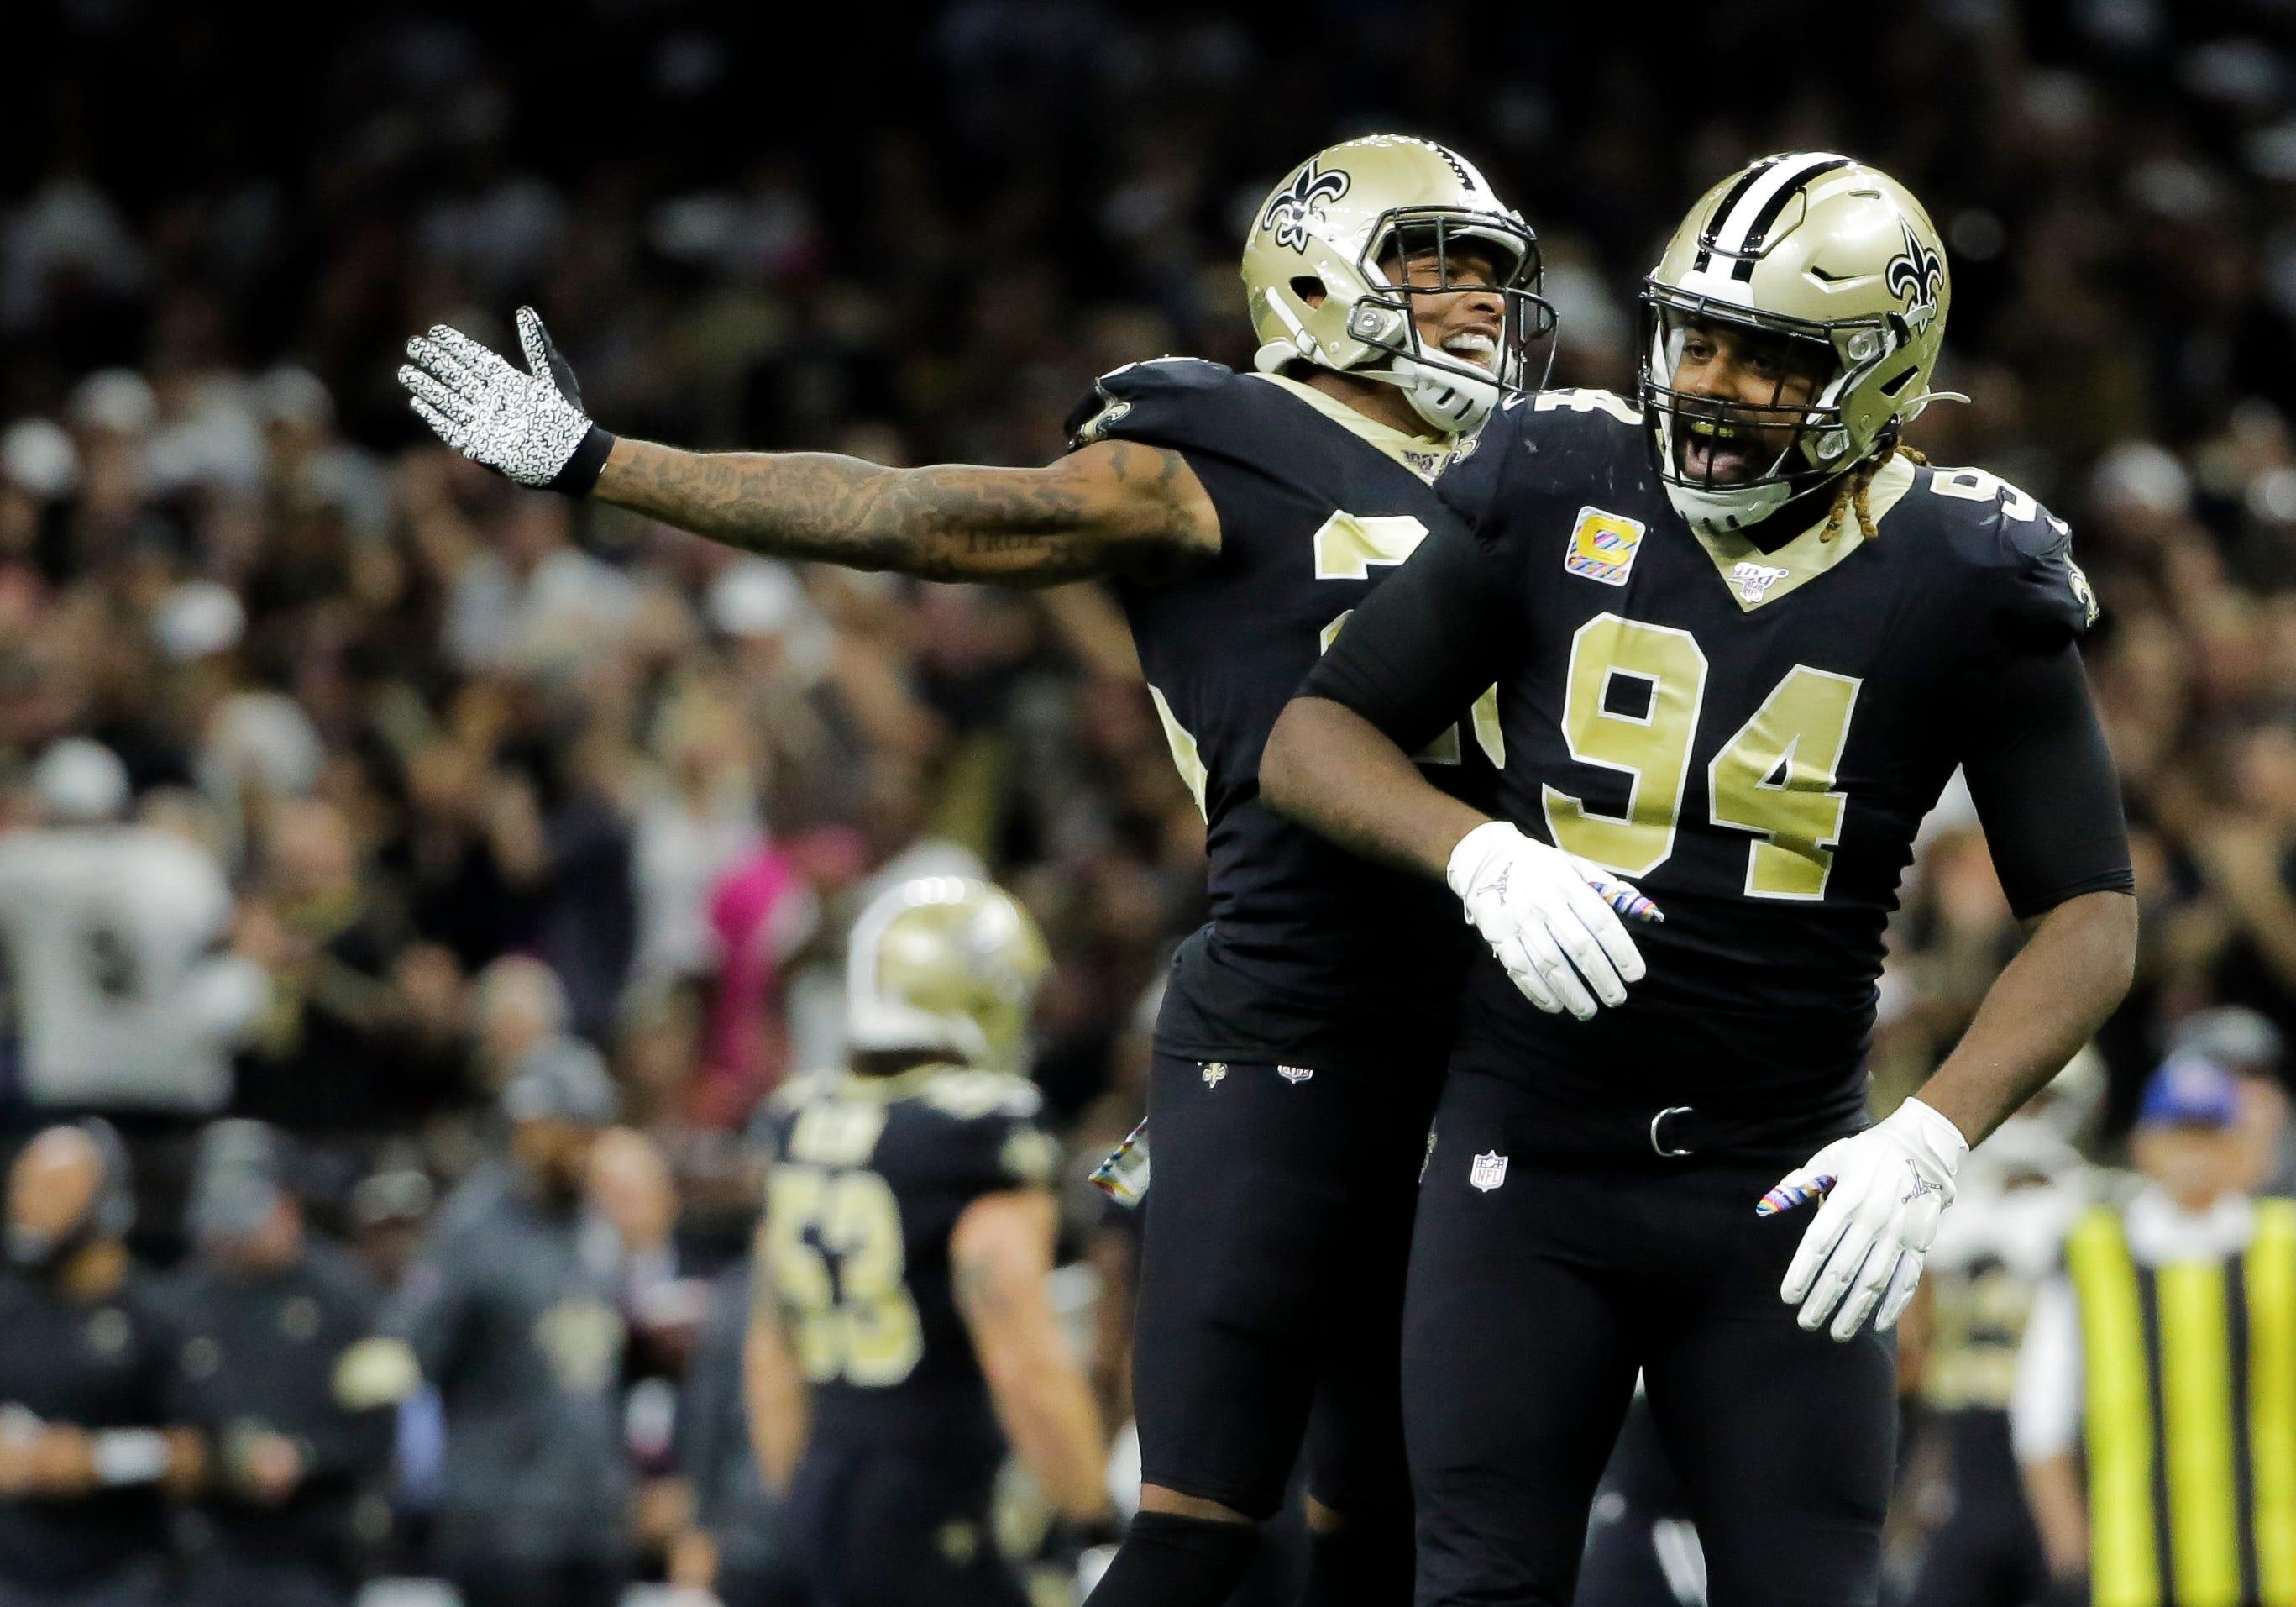 NFL roundtable: Whos best team in loaded NFC field of contenders?